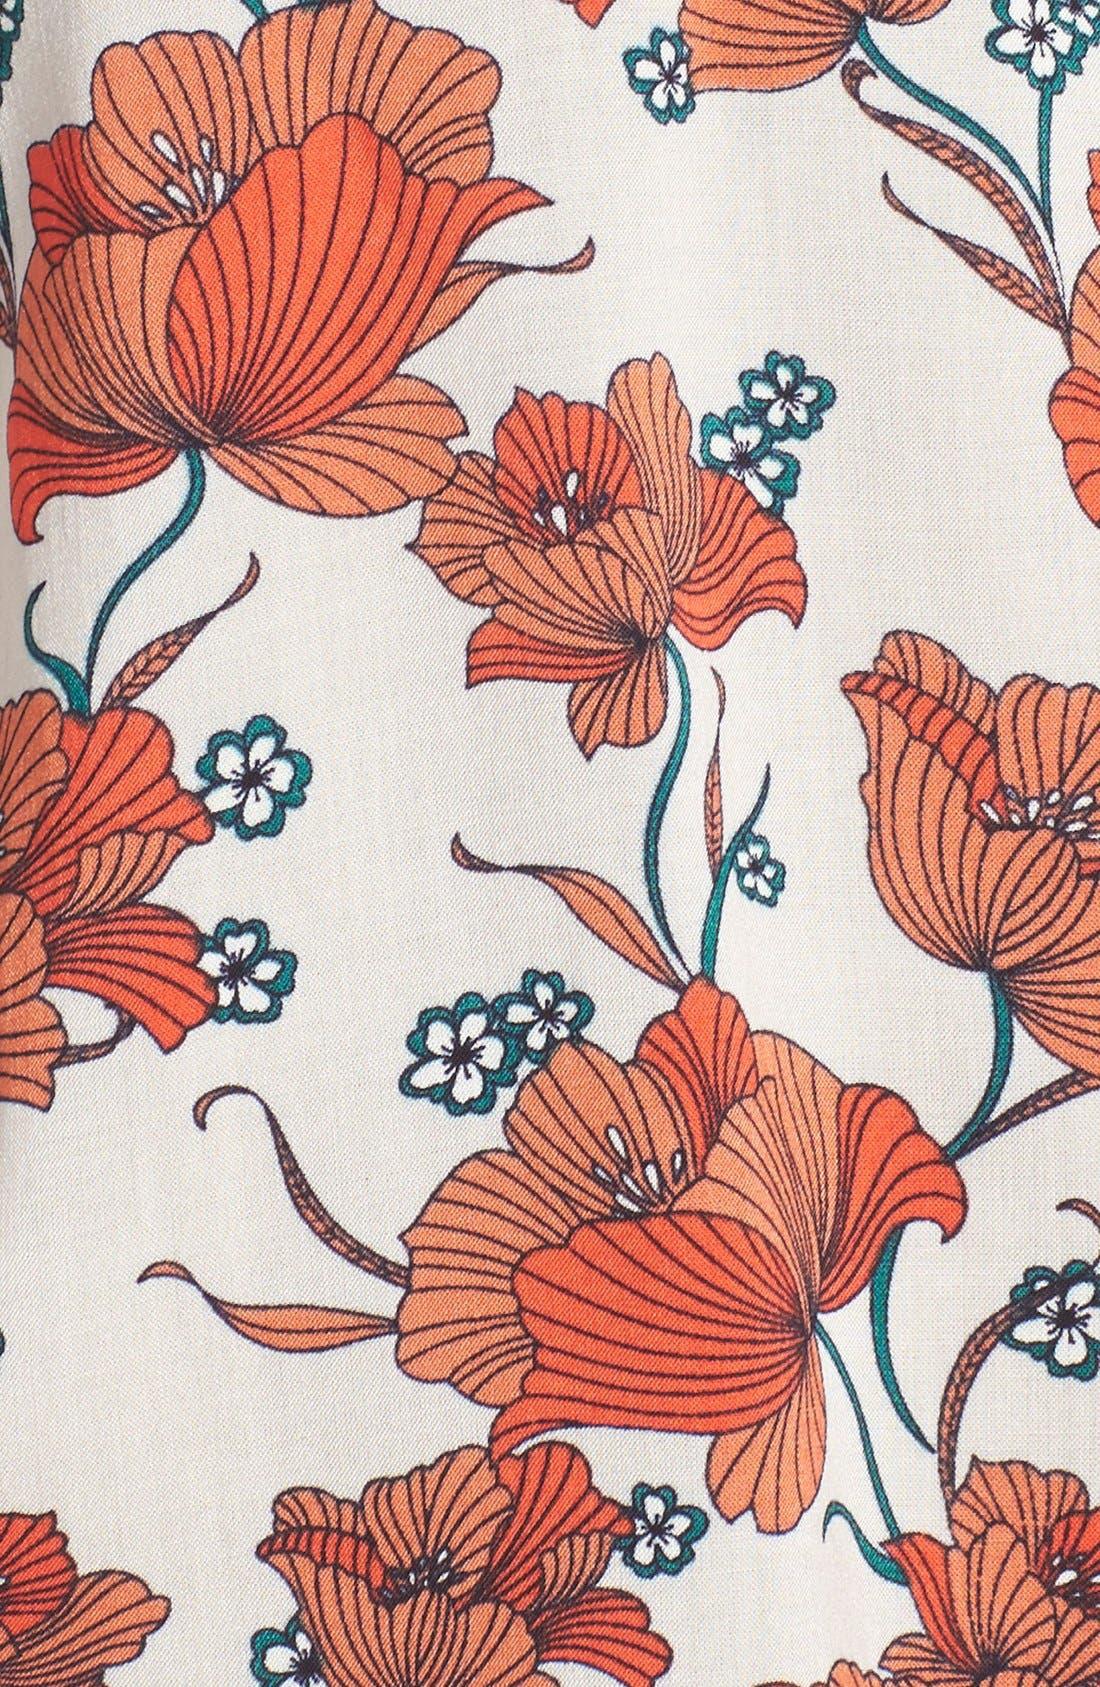 ASTR Mixed Print Off the Shoulder Top,                             Alternate thumbnail 6, color,                             Orange Multi Floral